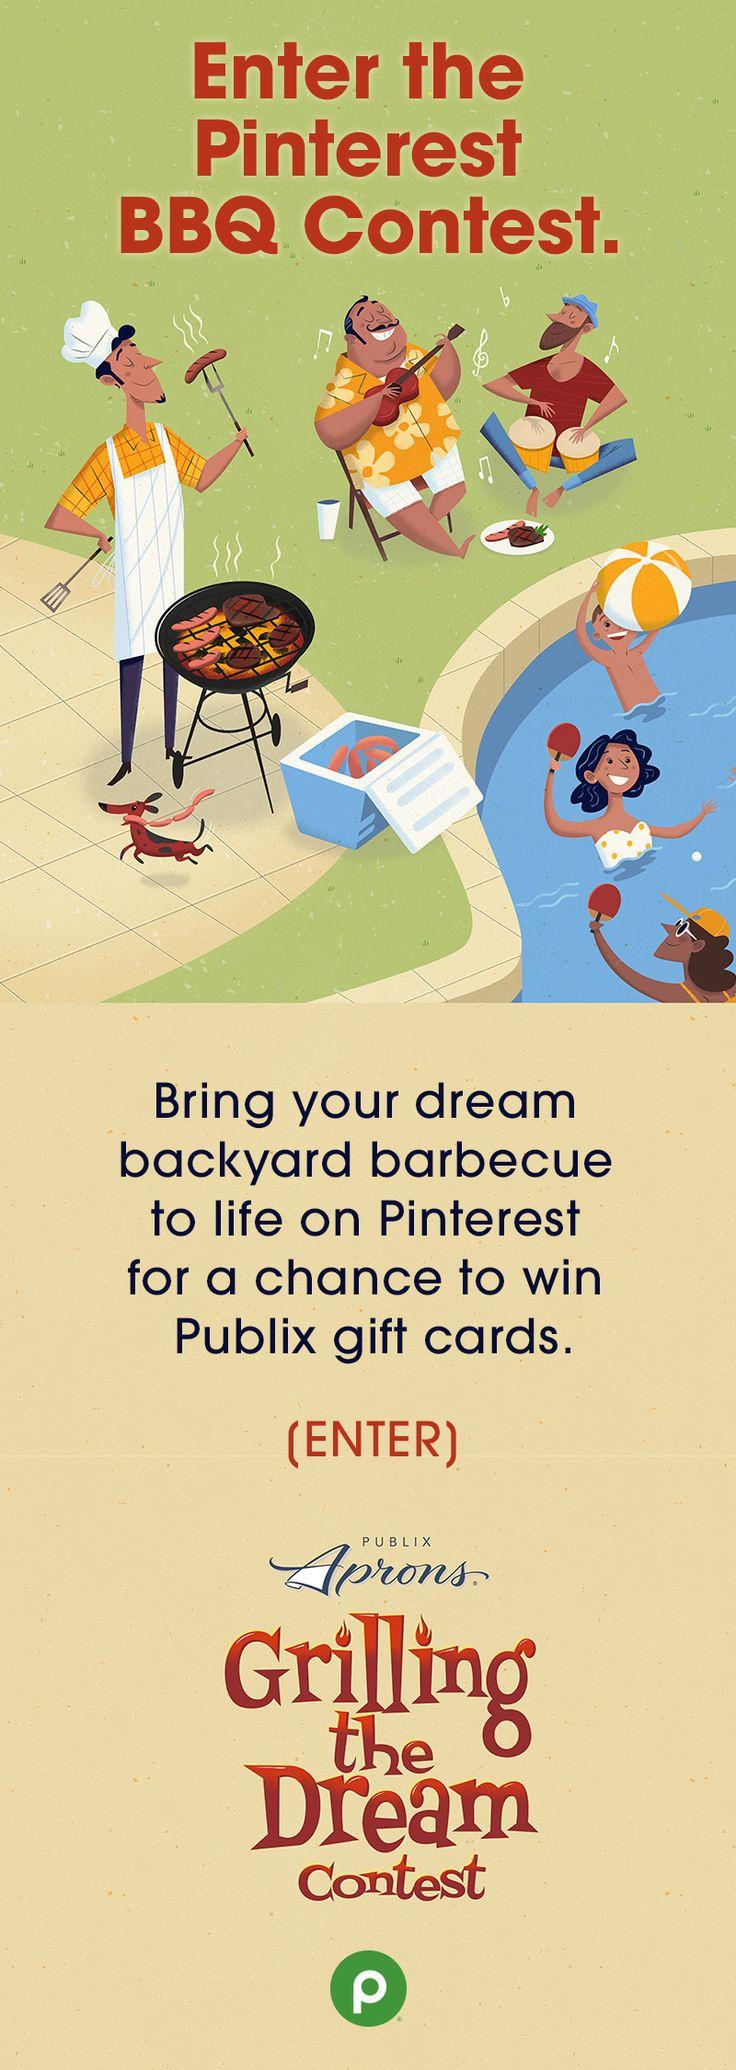 115 best GRILLING DREAMS BY PUBLIX images on Pinterest   Cooker ...